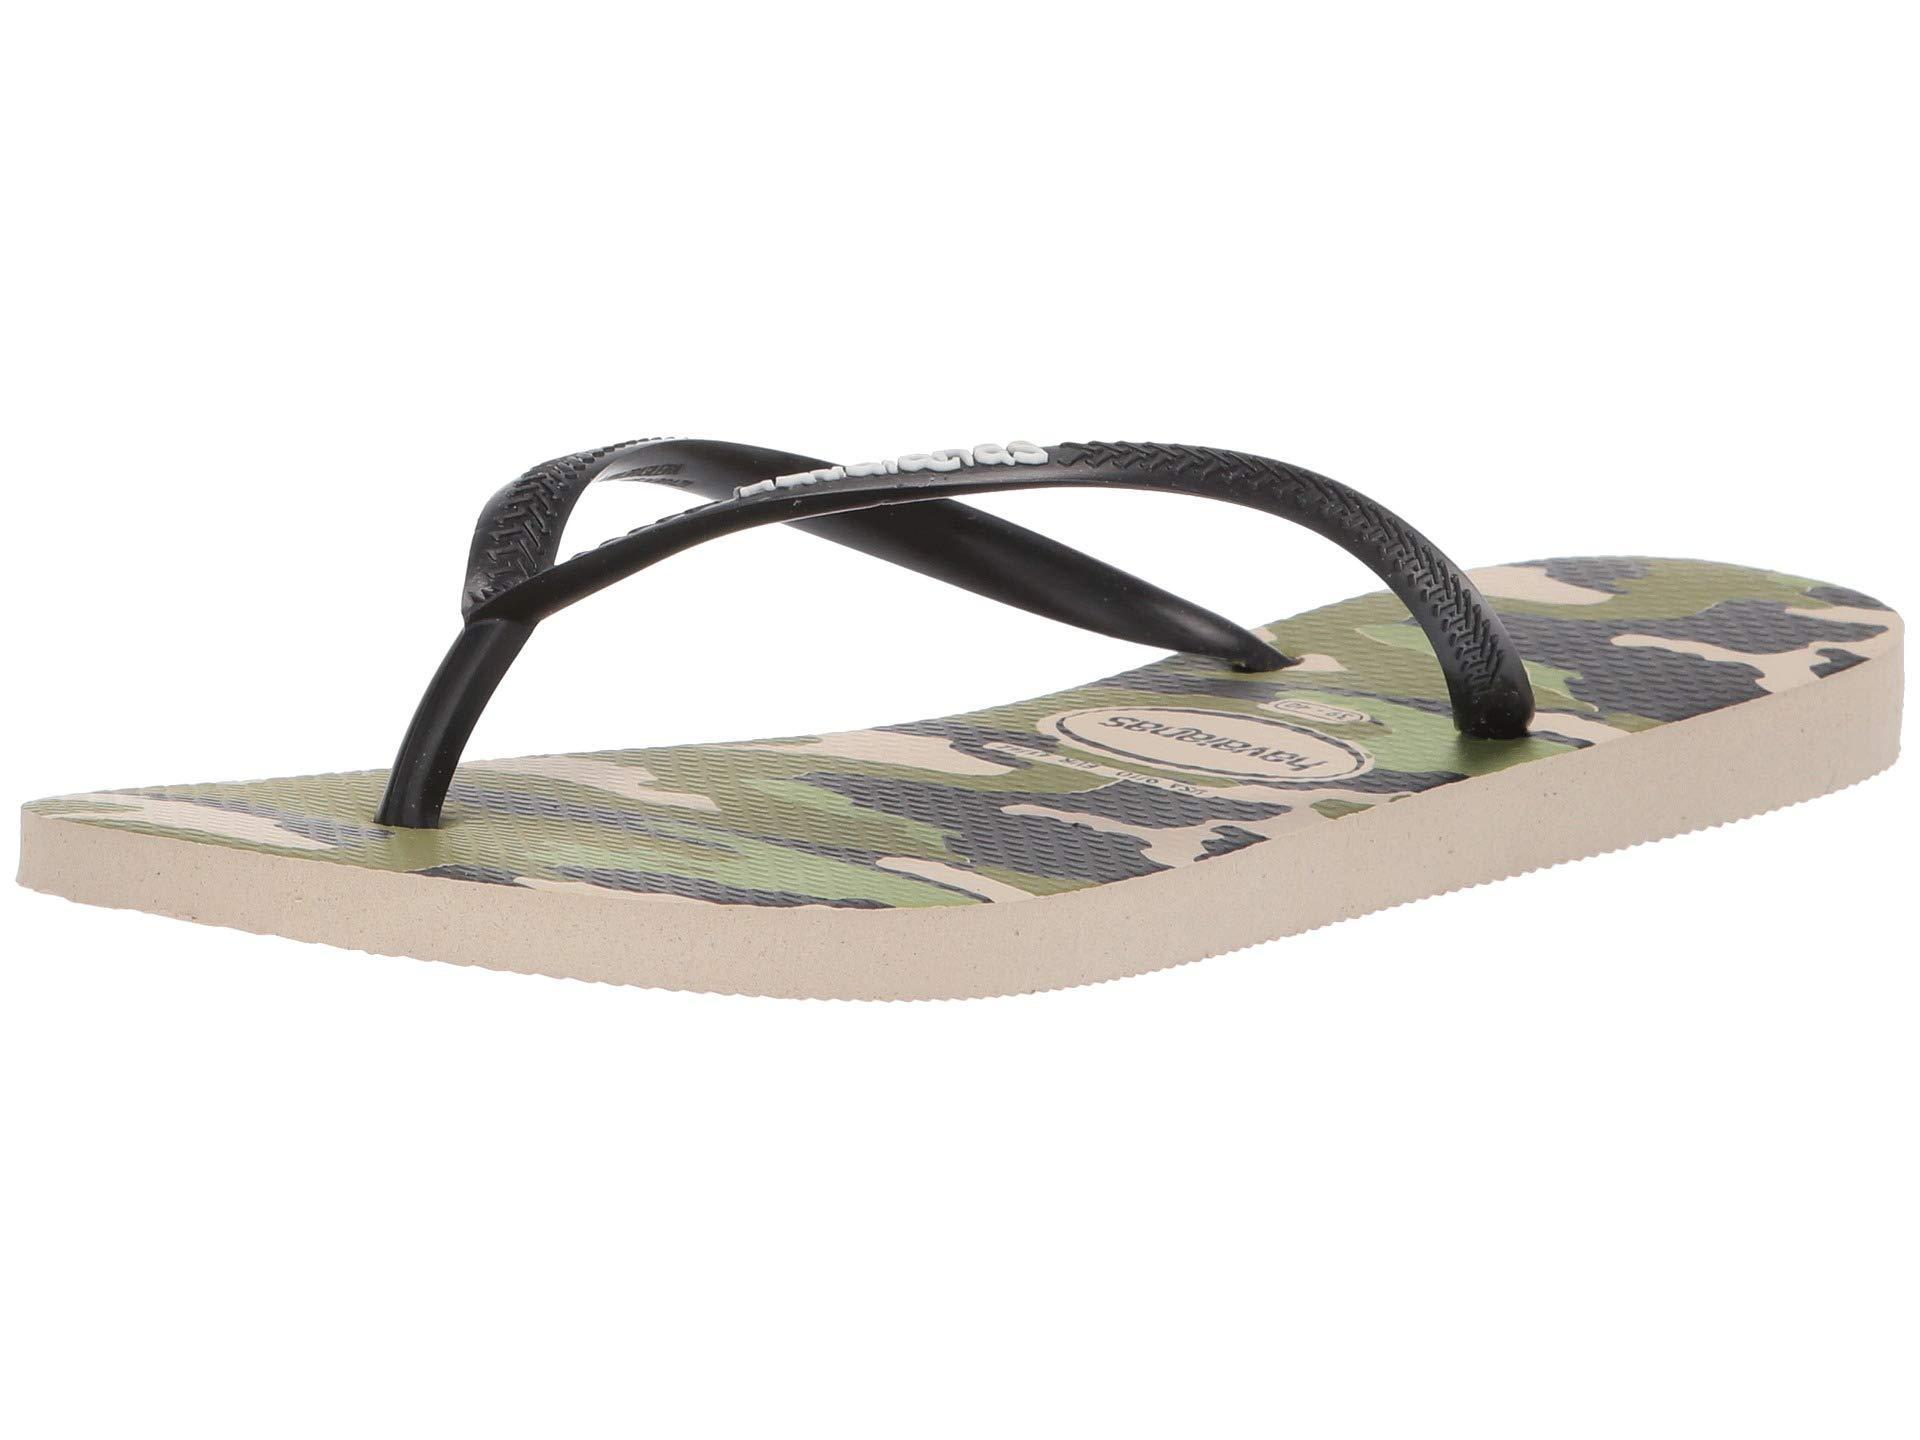 331c653286bdf Lyst - Havaianas Slim Camo Sandal (beige black) Women s Sandals in ...